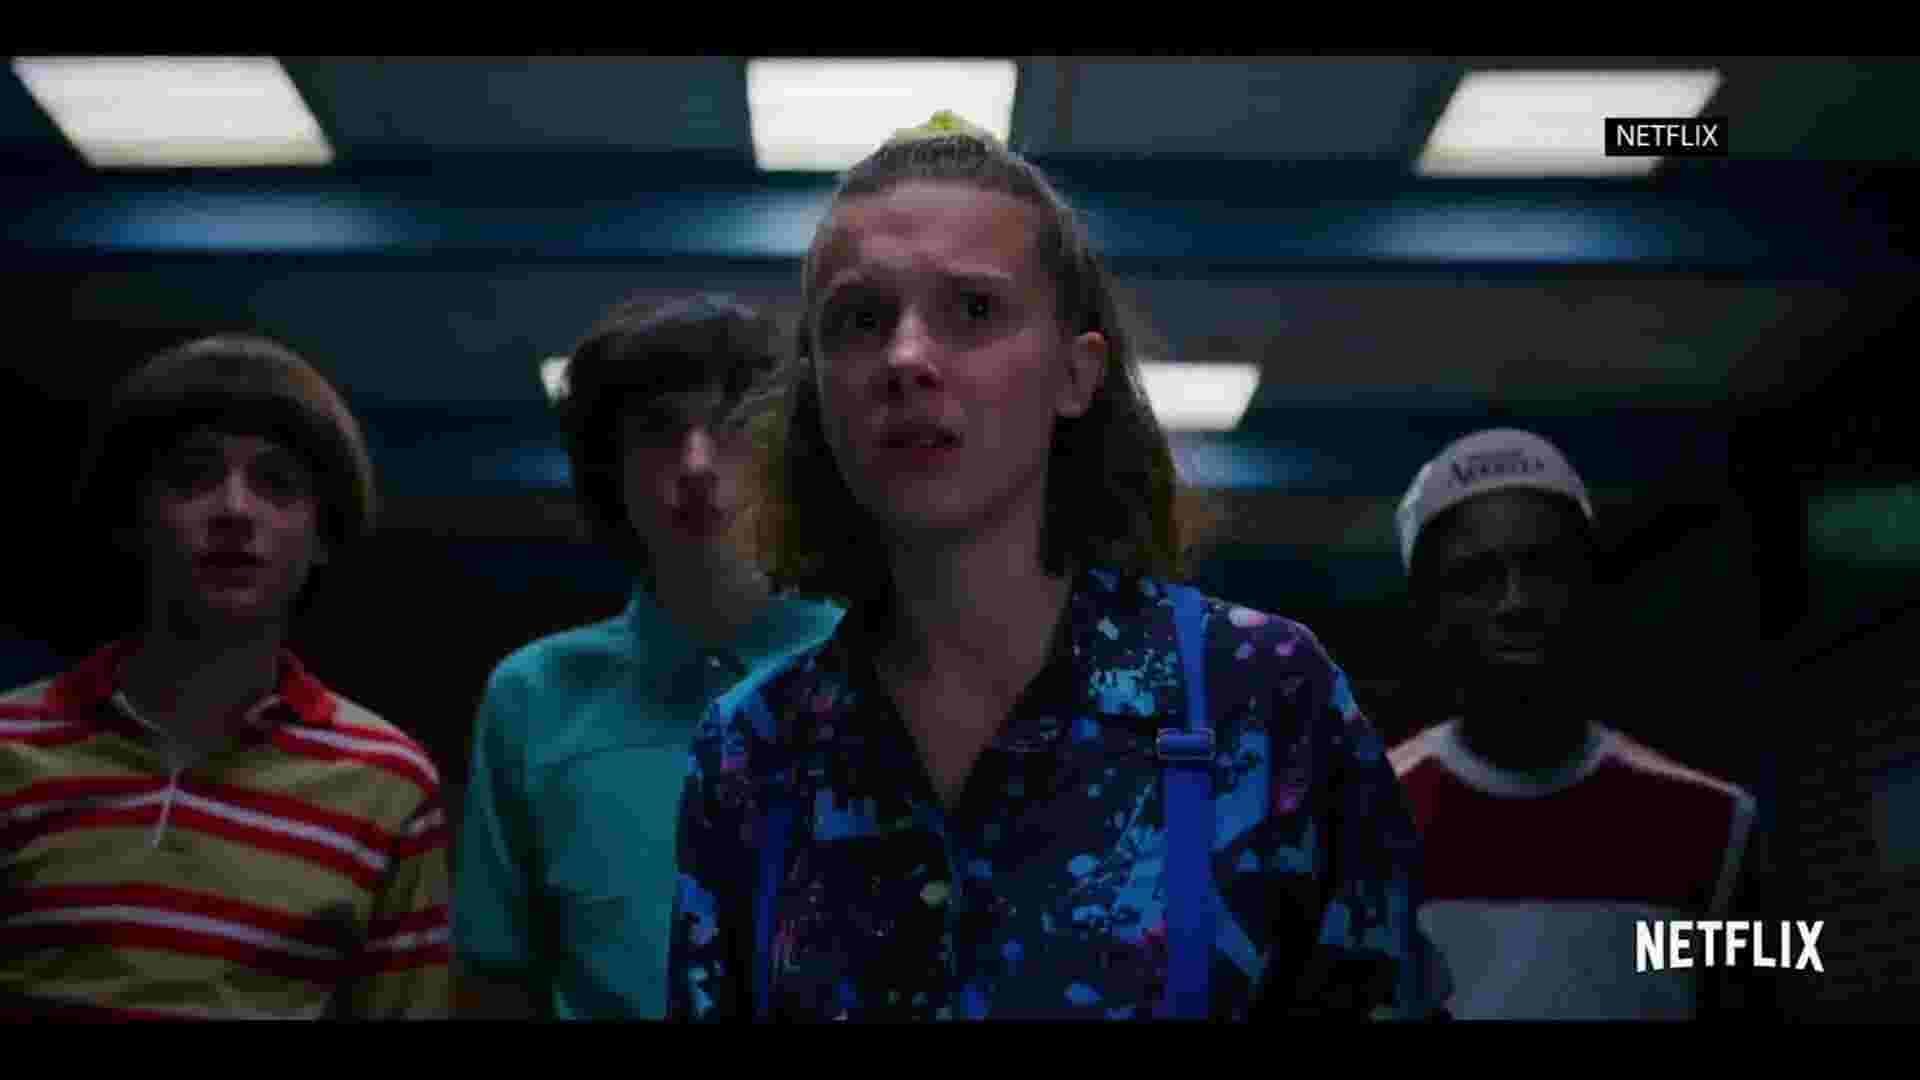 Stranger Things Cast Promises Scary, Mature New Season-4369